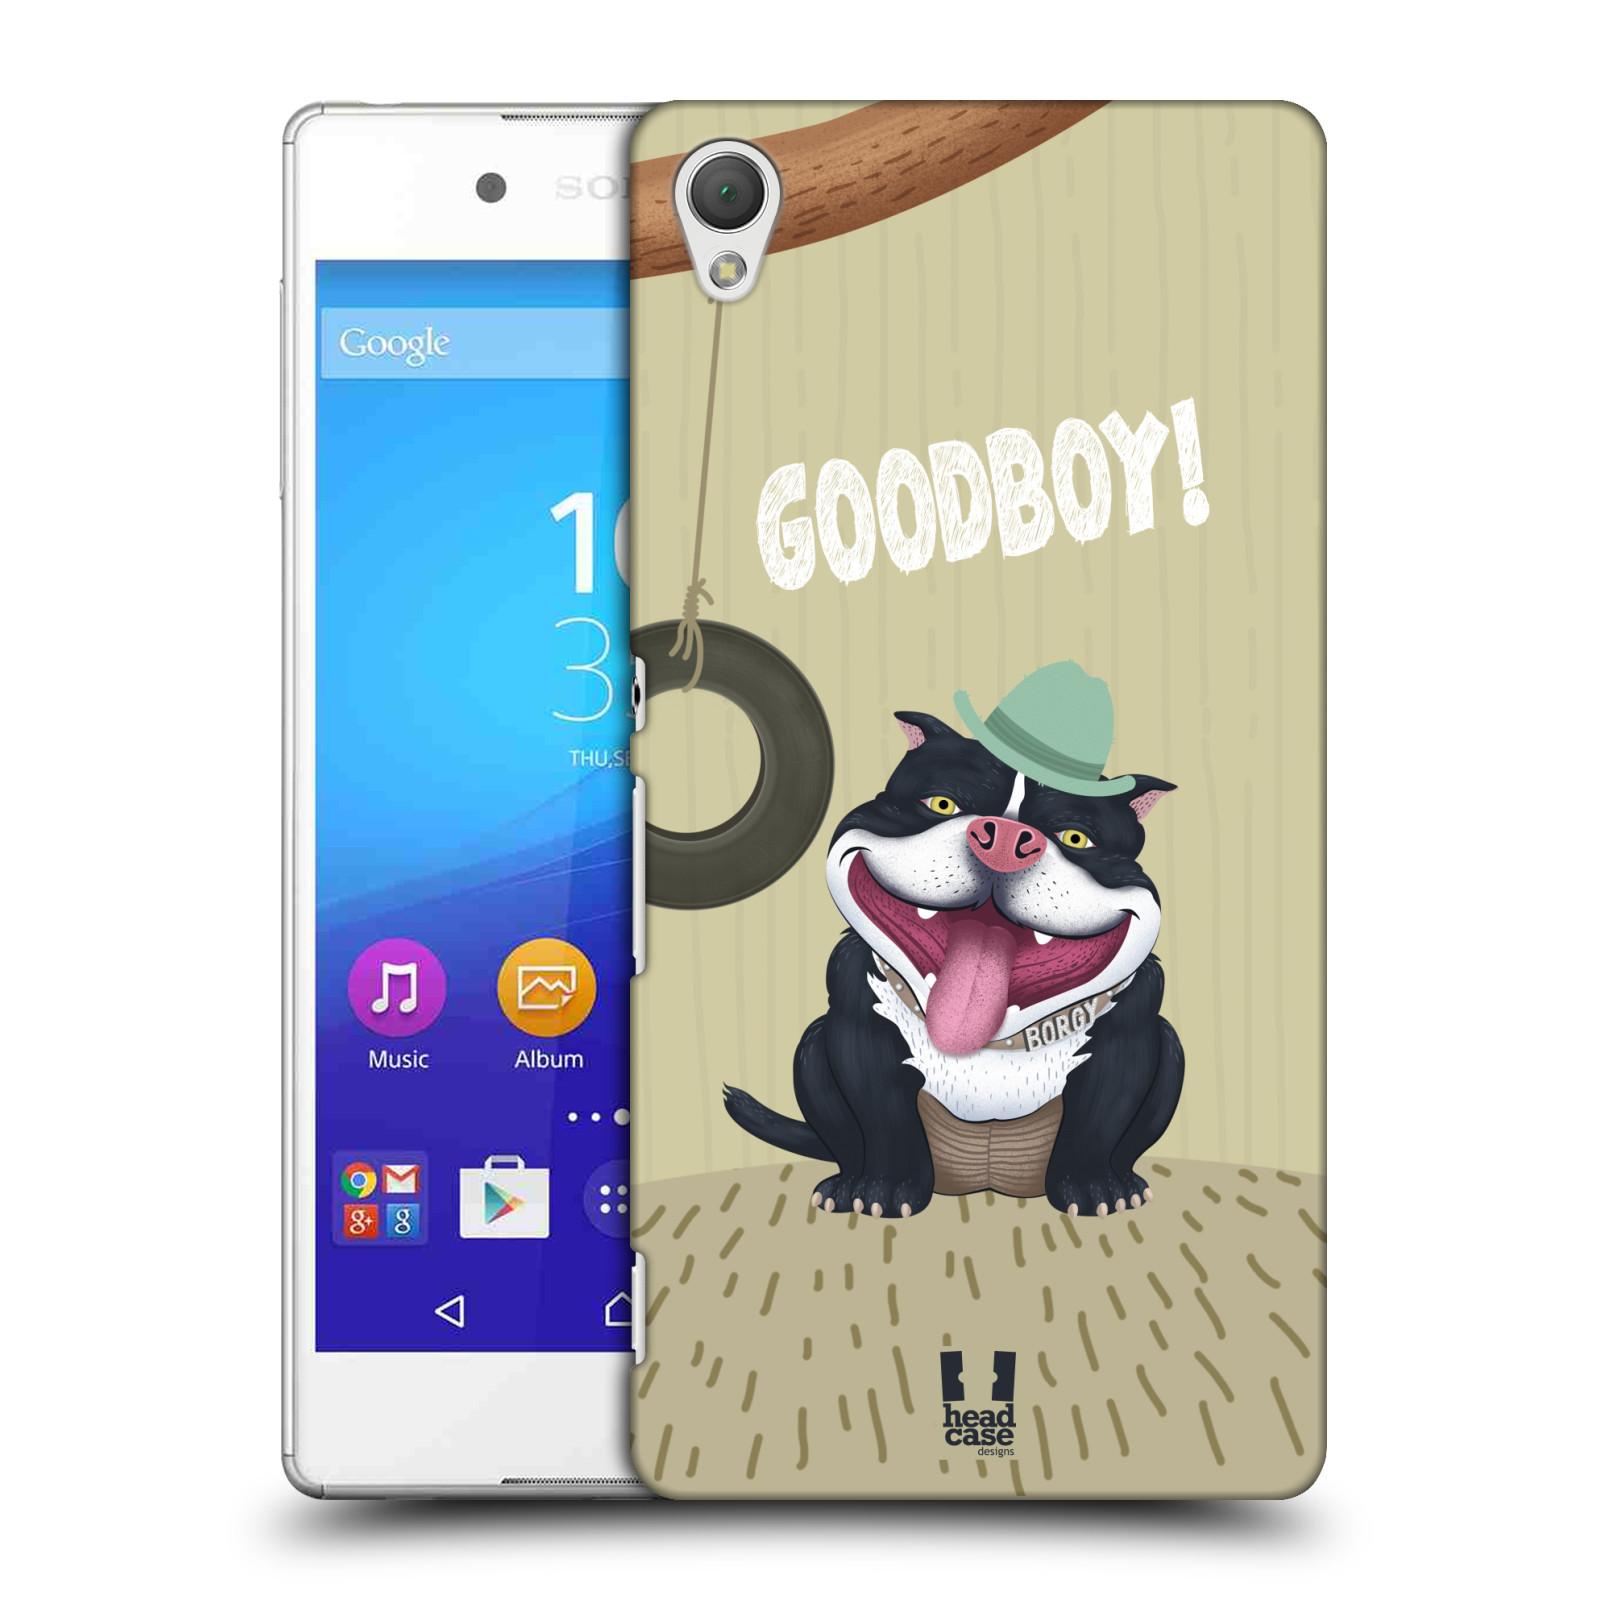 Plastové pouzdro na mobil Sony Xperia Z3+ (Plus) HEAD CASE Goodboy! Pejsek (Kryt či obal na mobilní telefon Sony Xperia Z3+ a Sony Xperia Z4 )